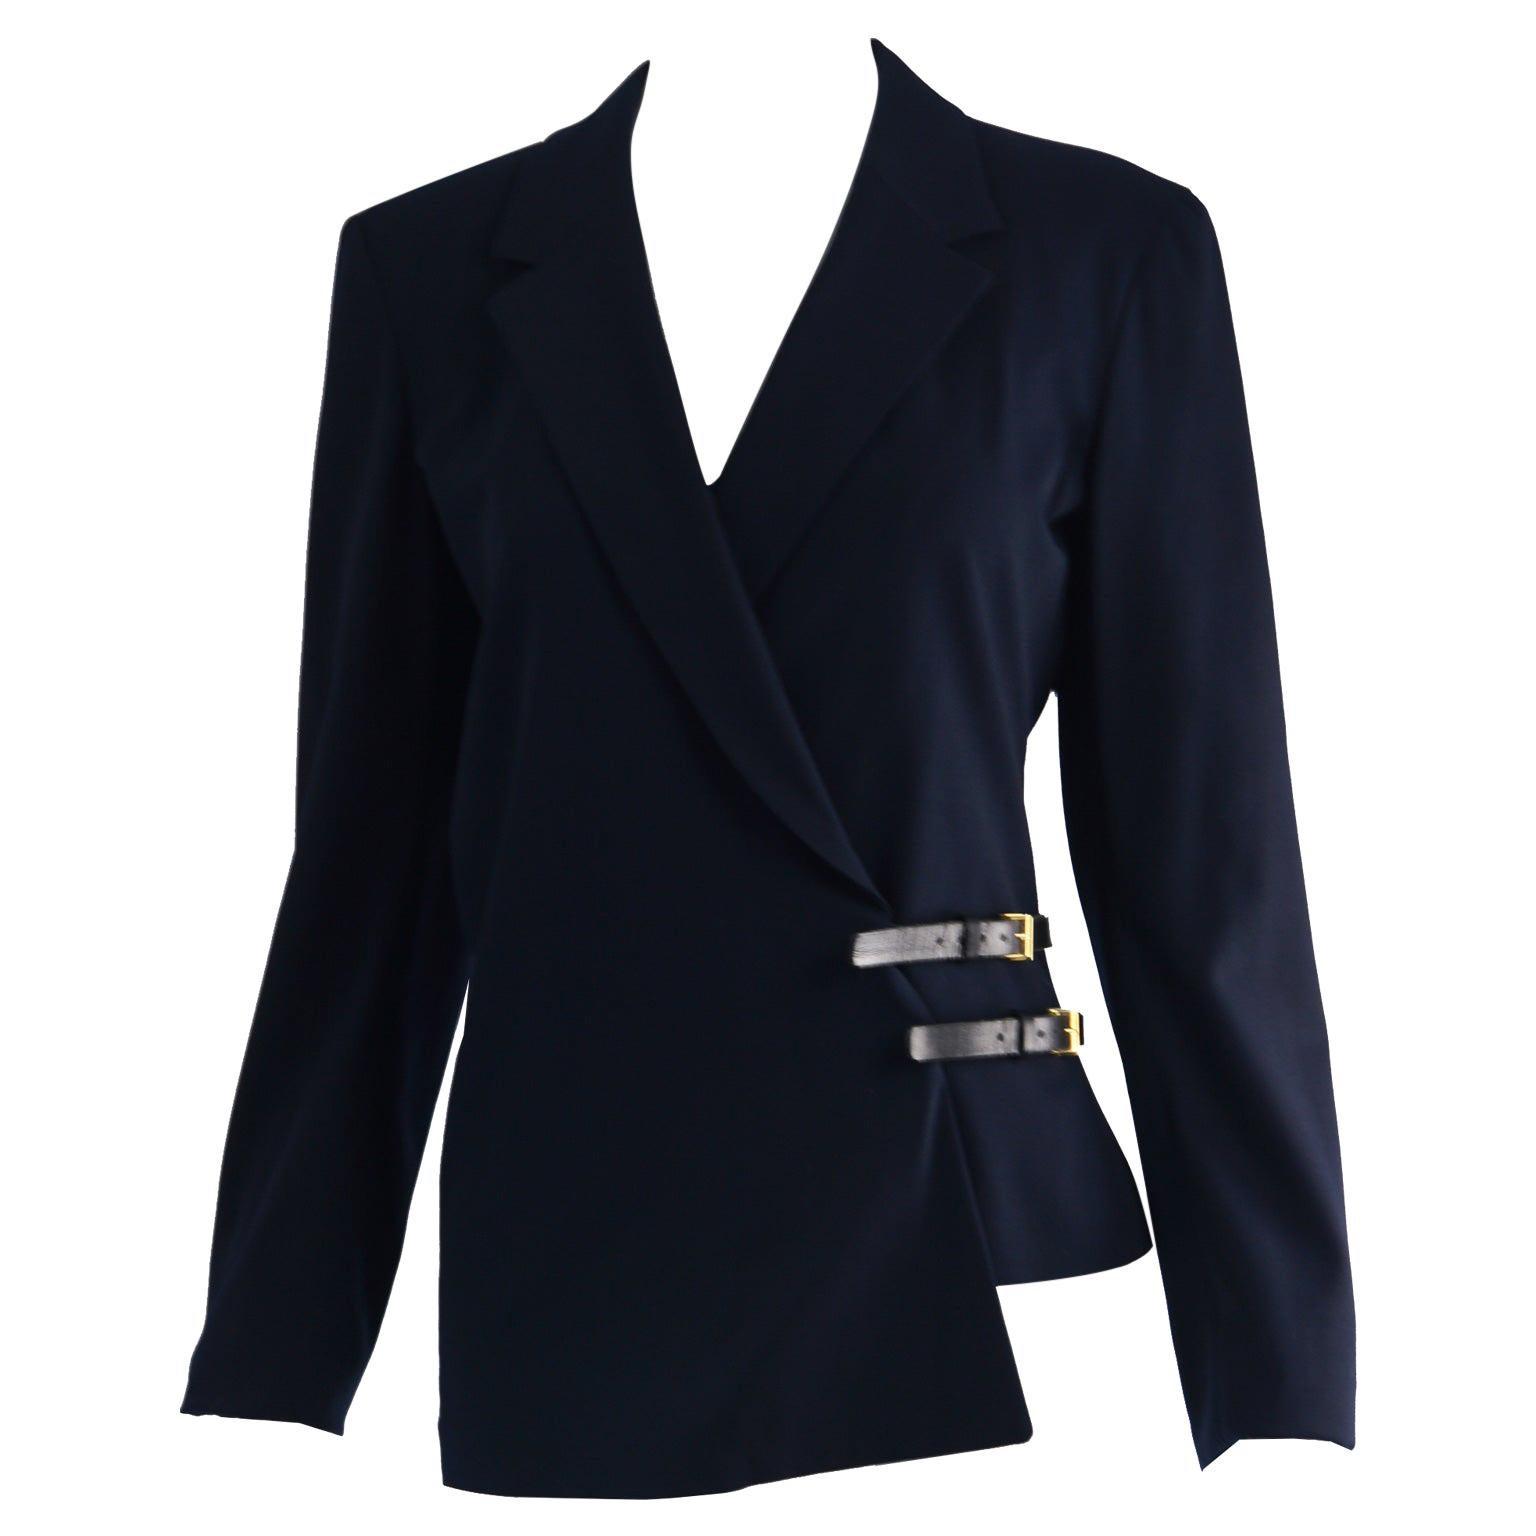 Donna Karan Signature Navy Blue Wool Tailored Jacket with Wraparound Belt